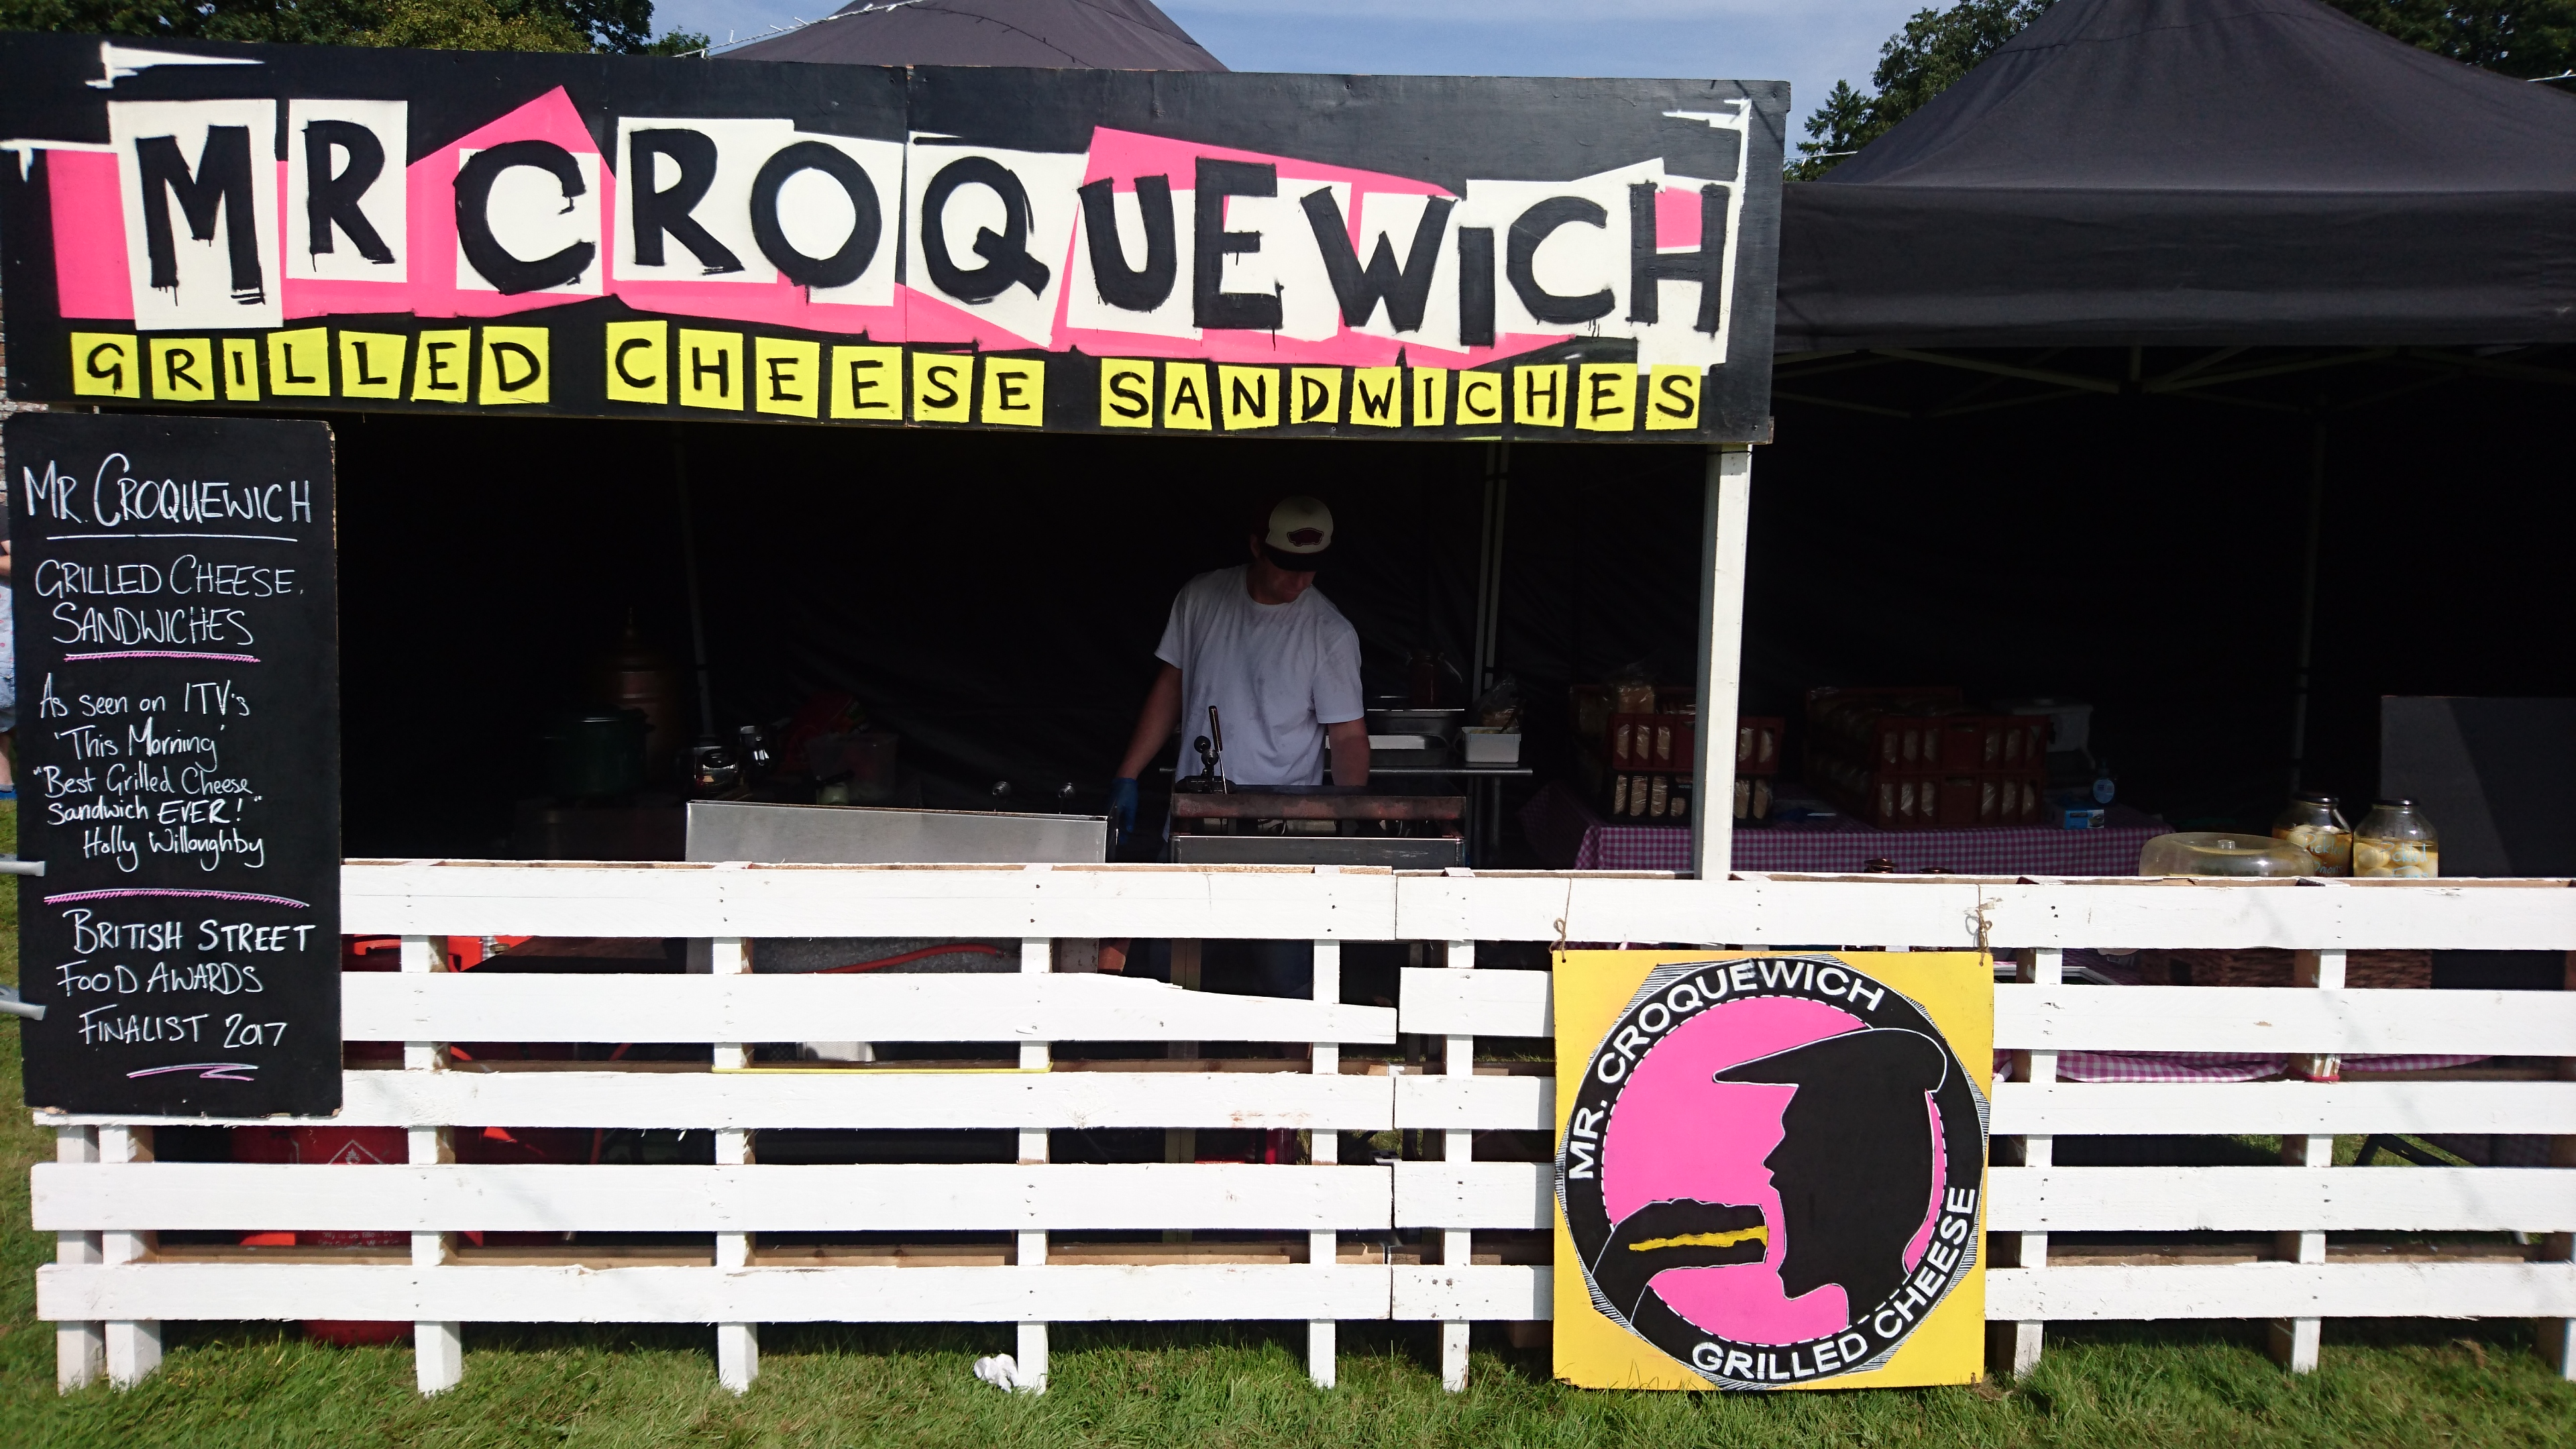 Mr Croquewich wedding catering